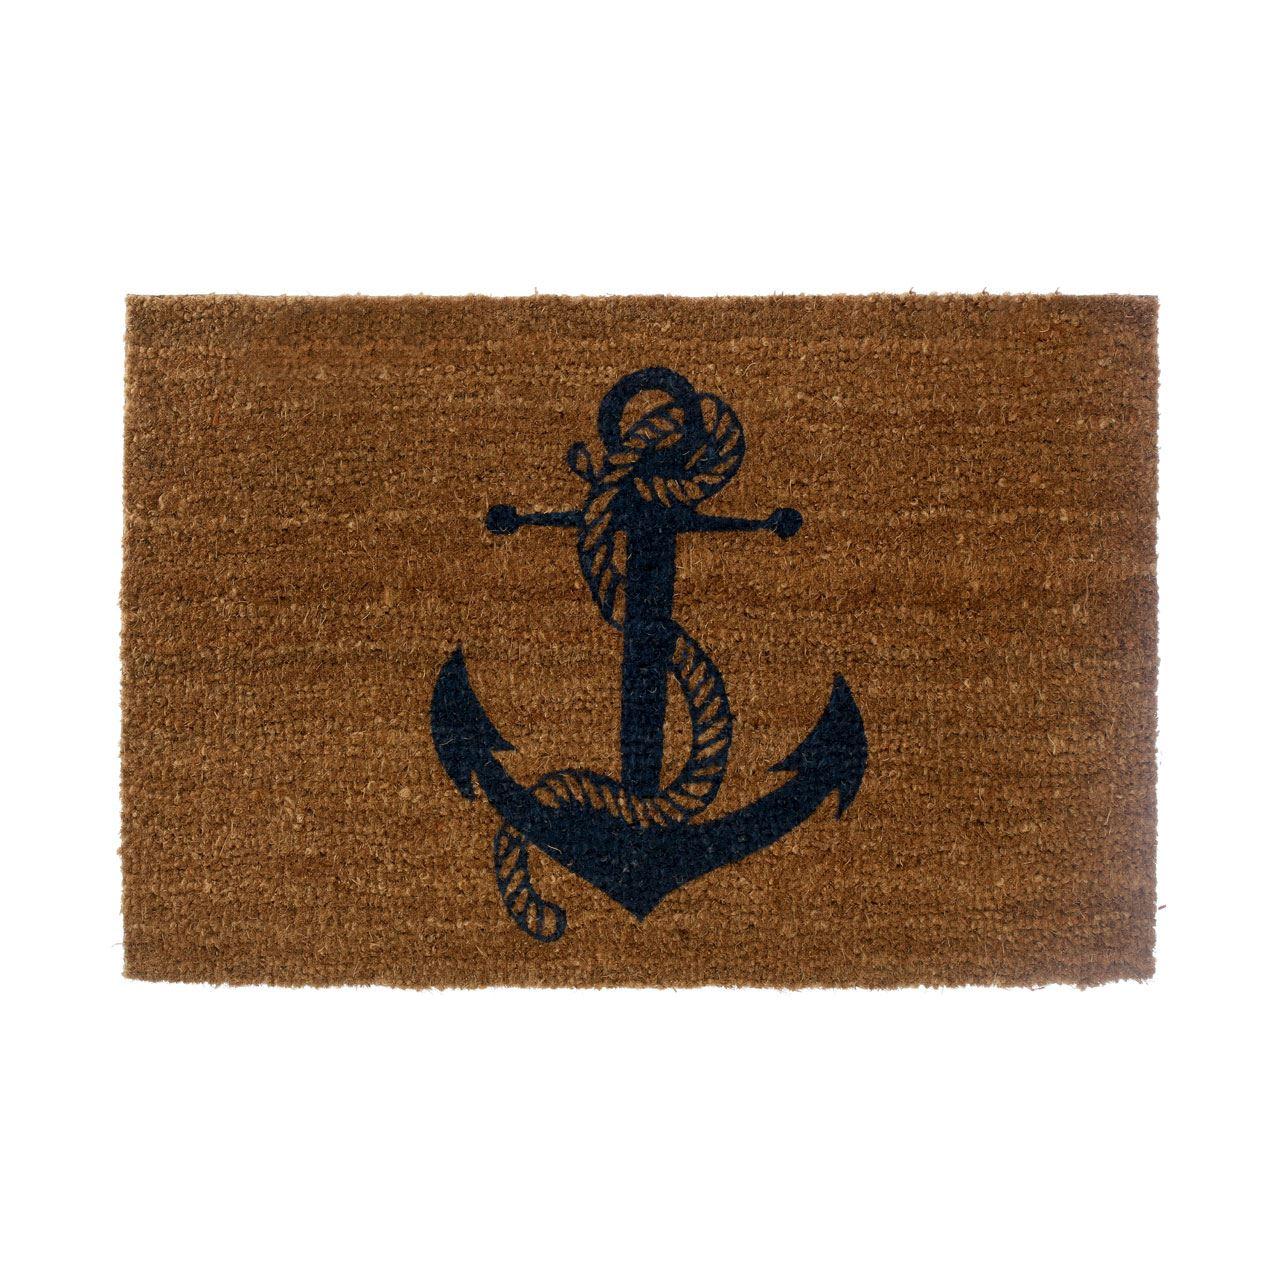 Sailor Doormat,Pvc Backed Coir